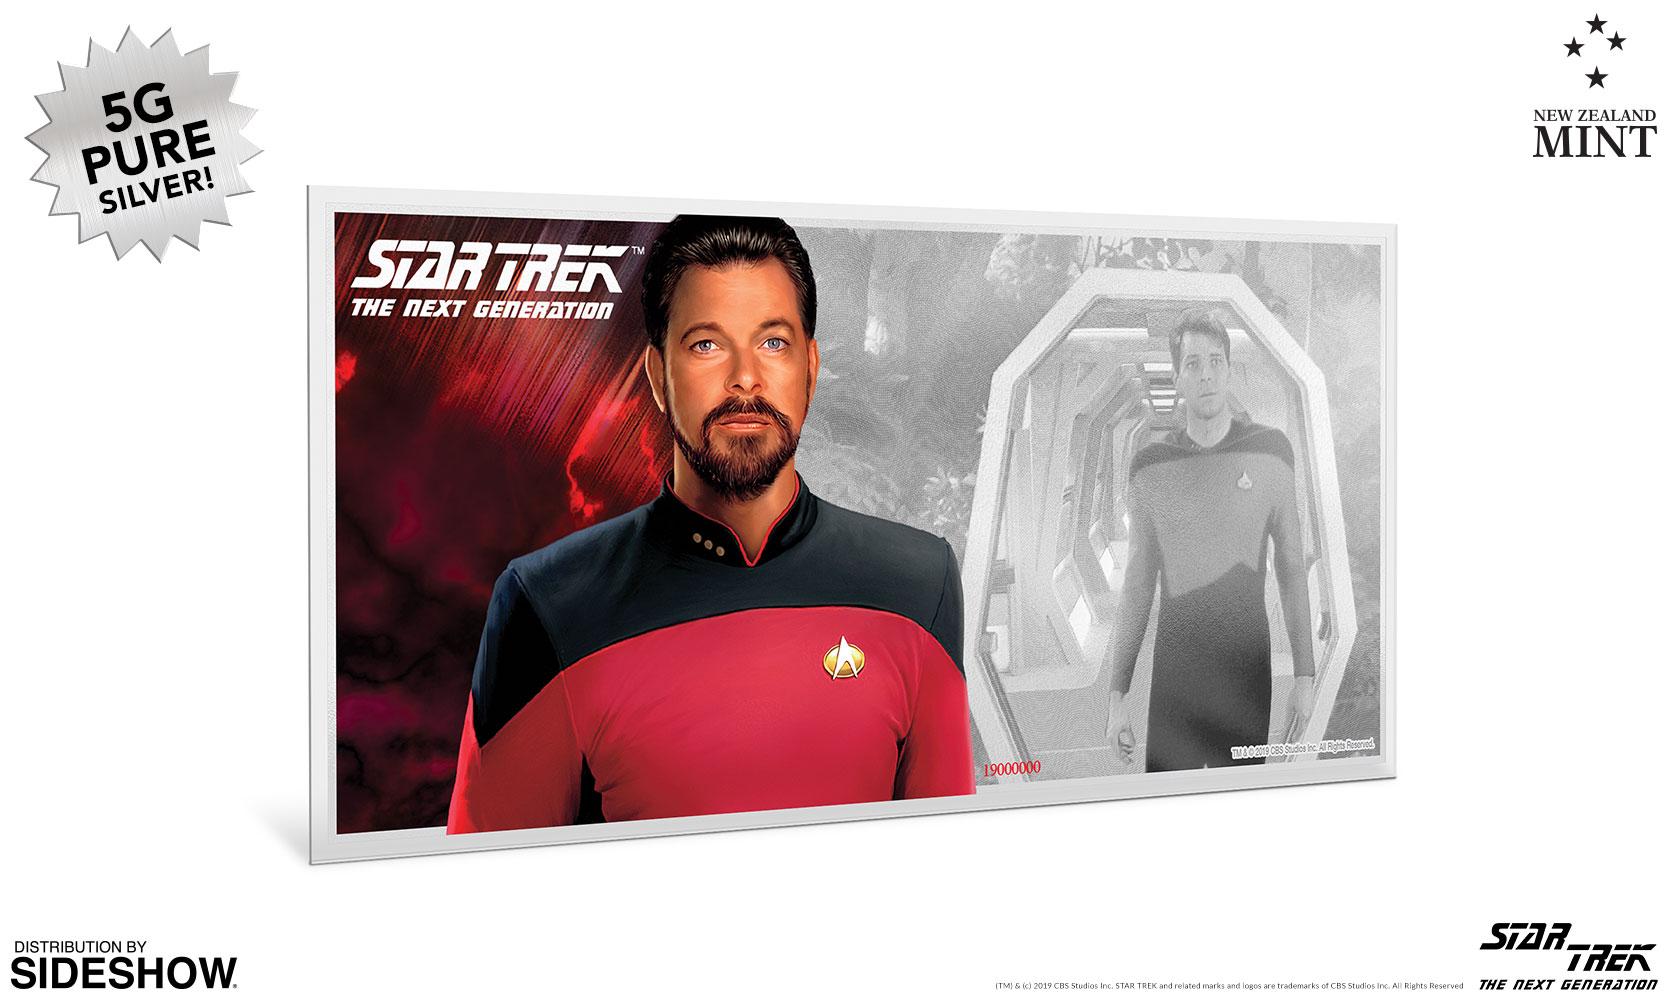 Star Trek II The Wrath of Khan Niue 2018 35g Pure Silver Foil